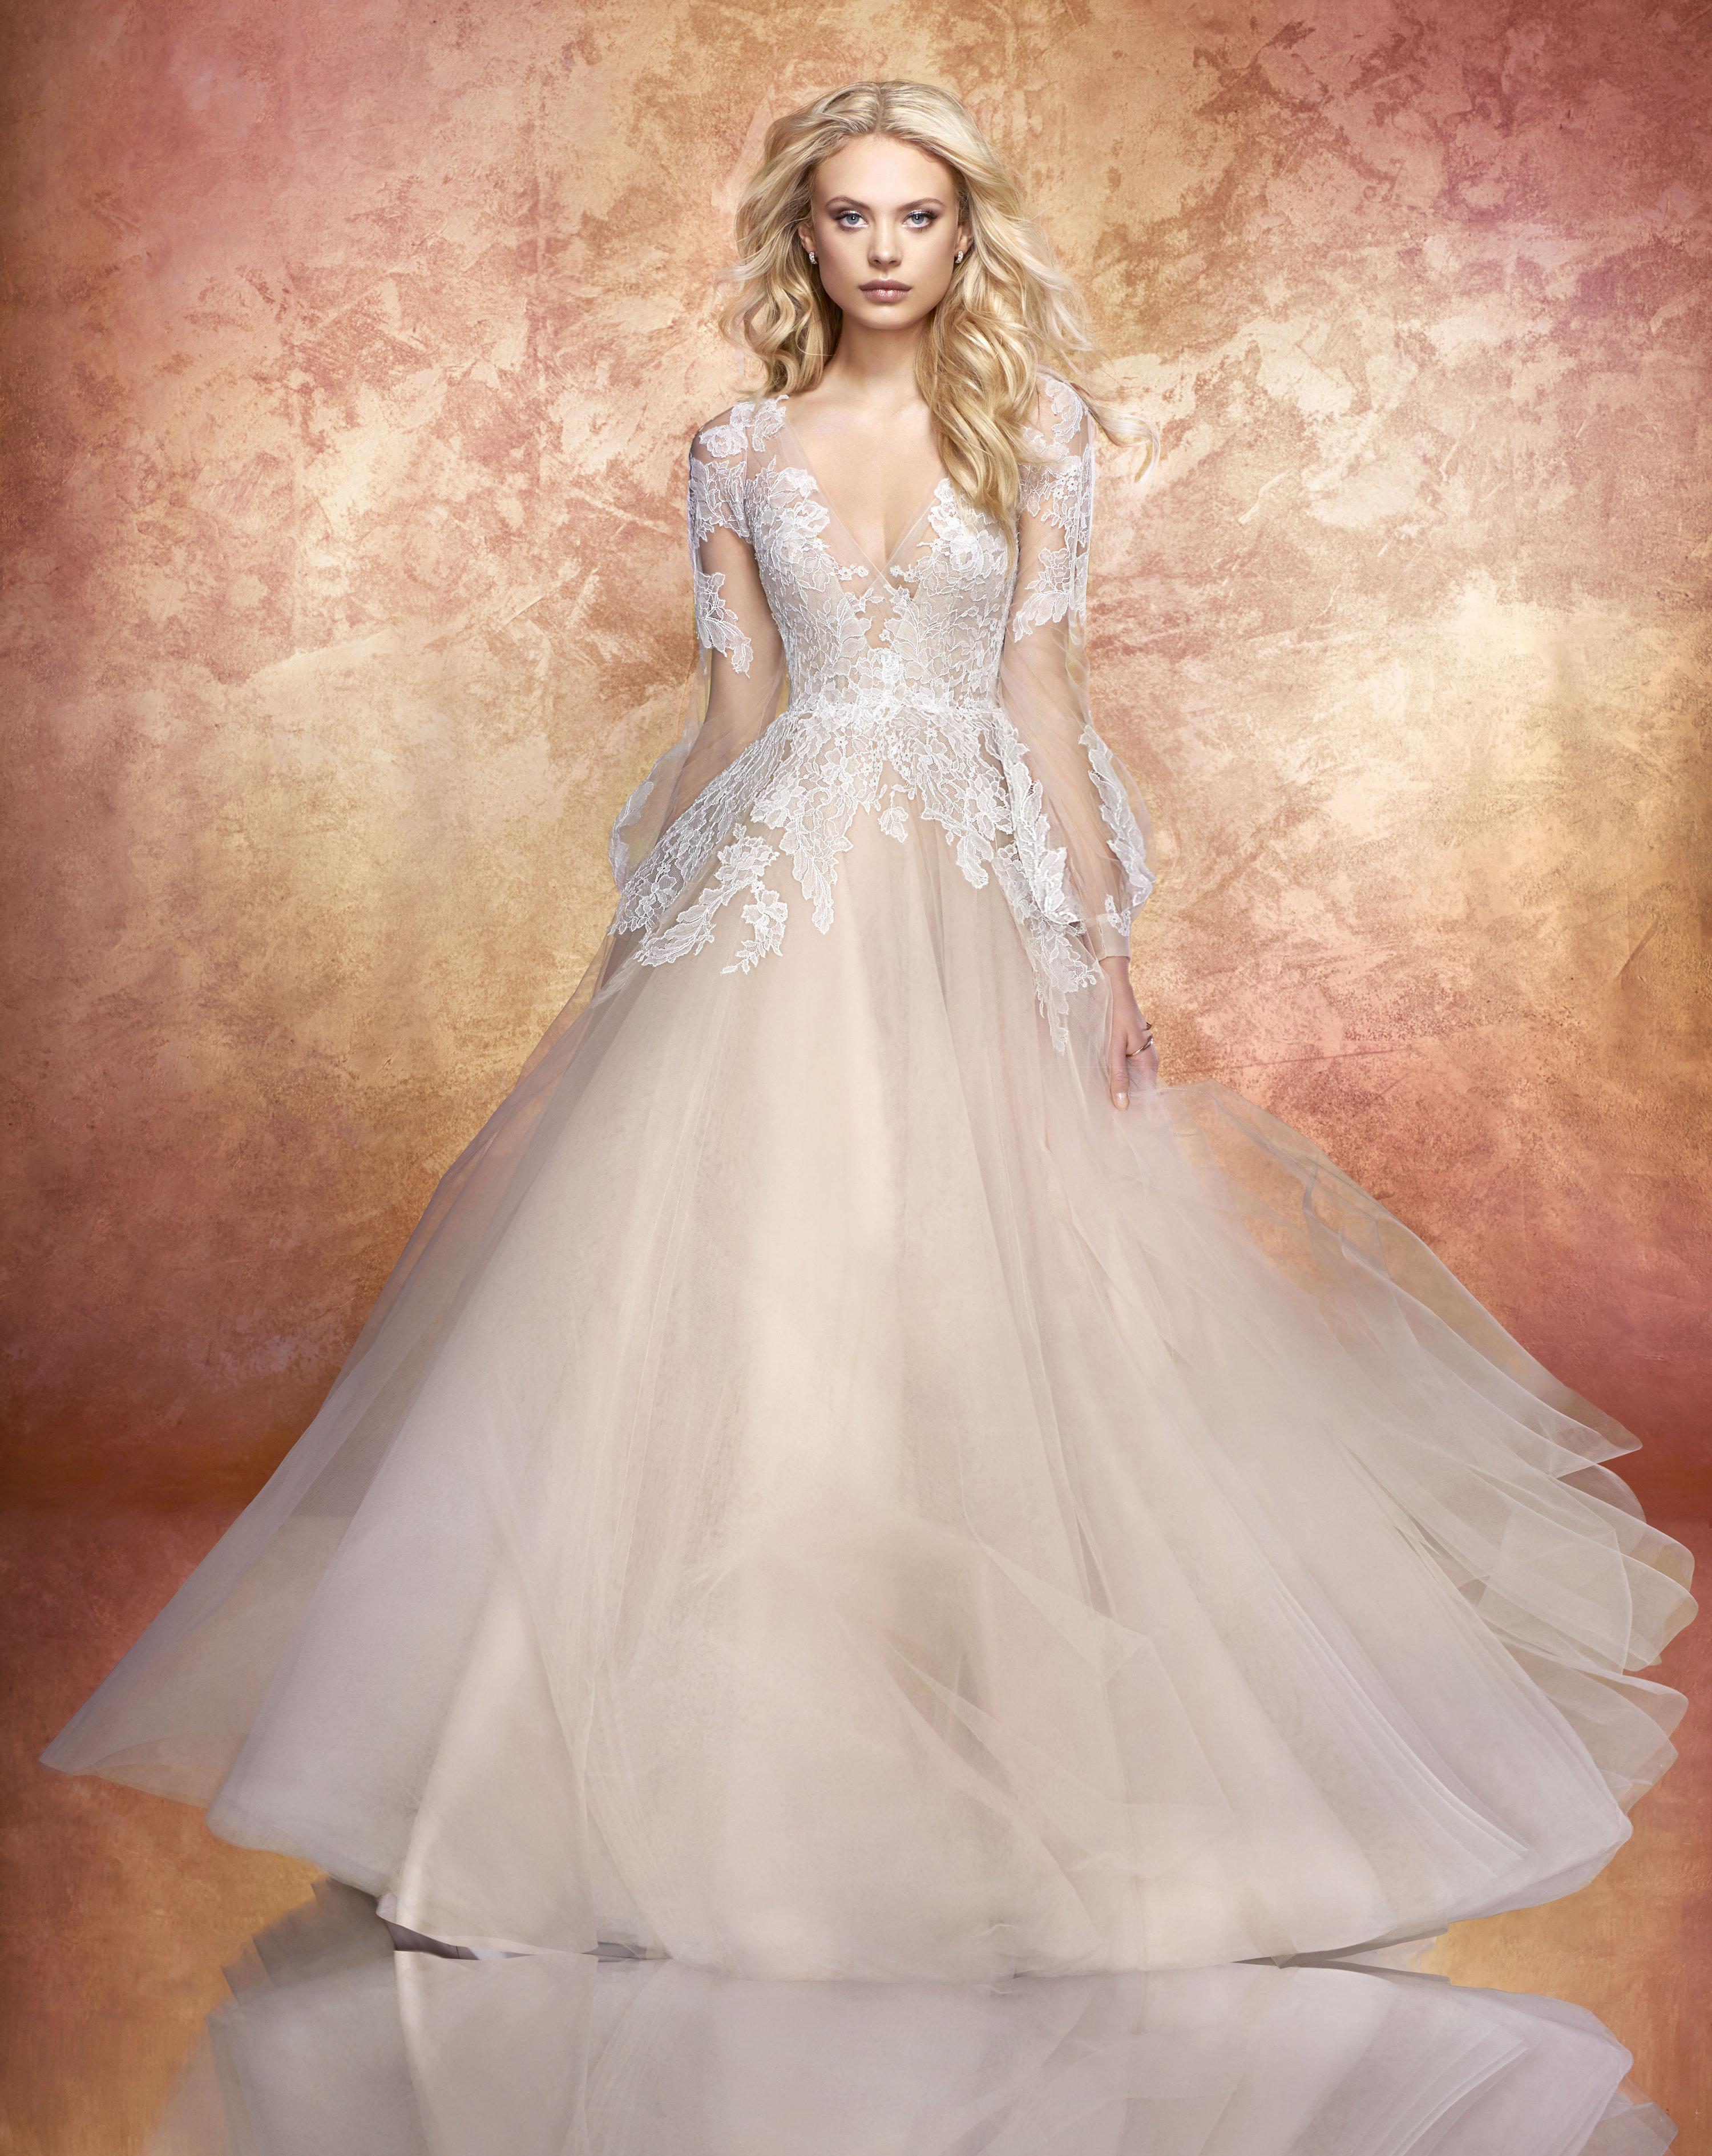 db56cb1c6e001 Romantic Ball Gown Wedding Dress | Kleinfeld Bridal